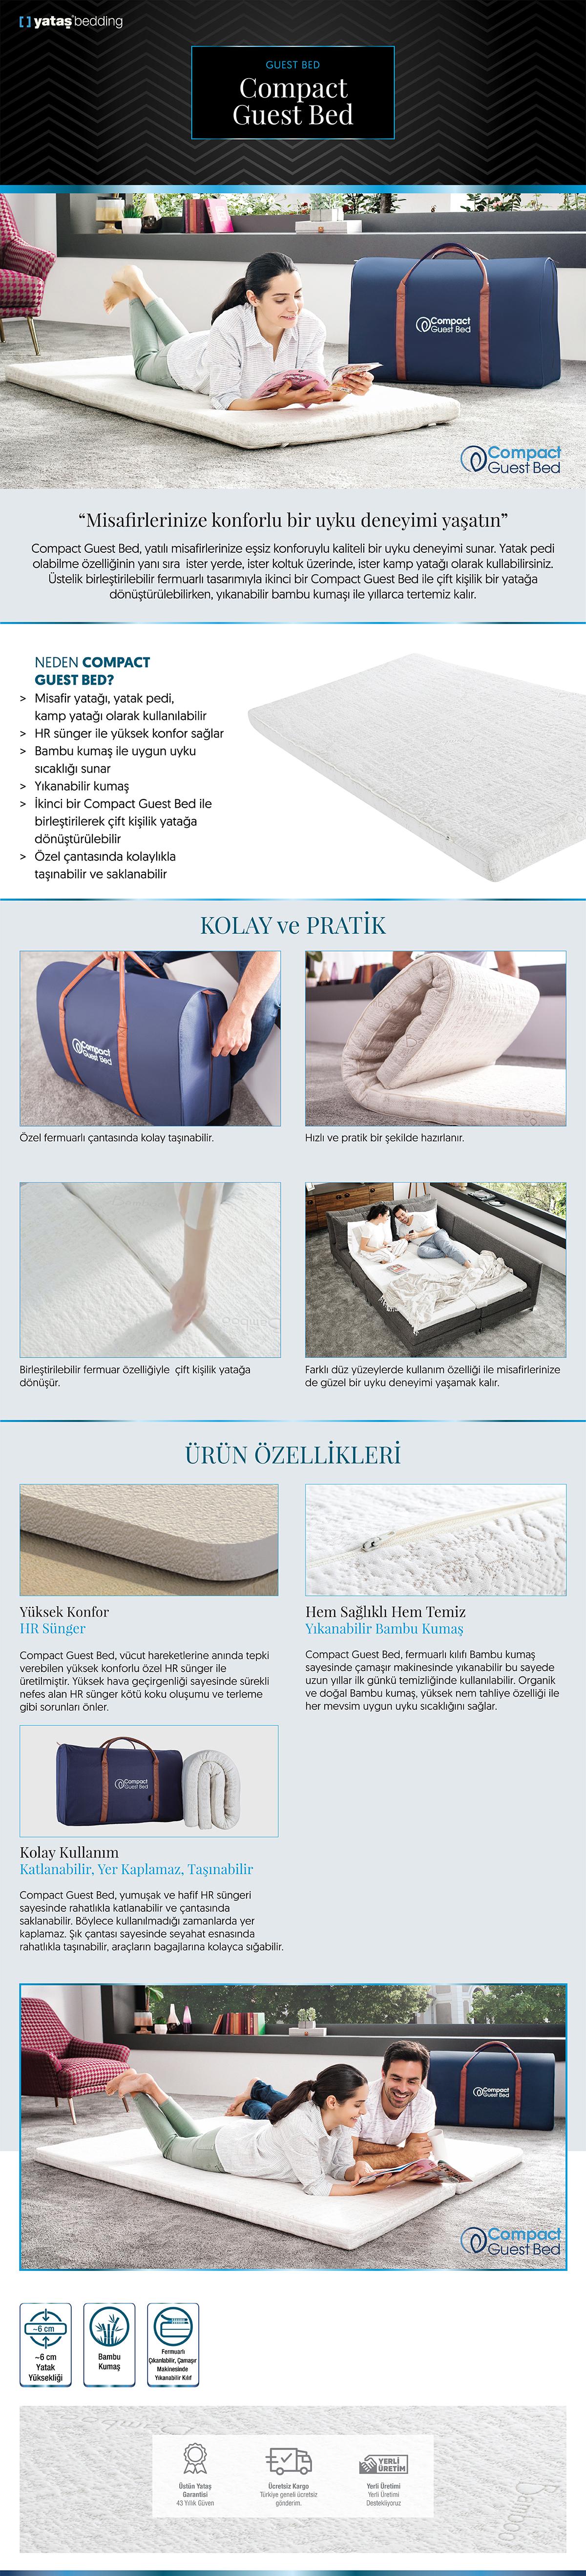 Bedding Compact Guest Bed Sünger Yatak